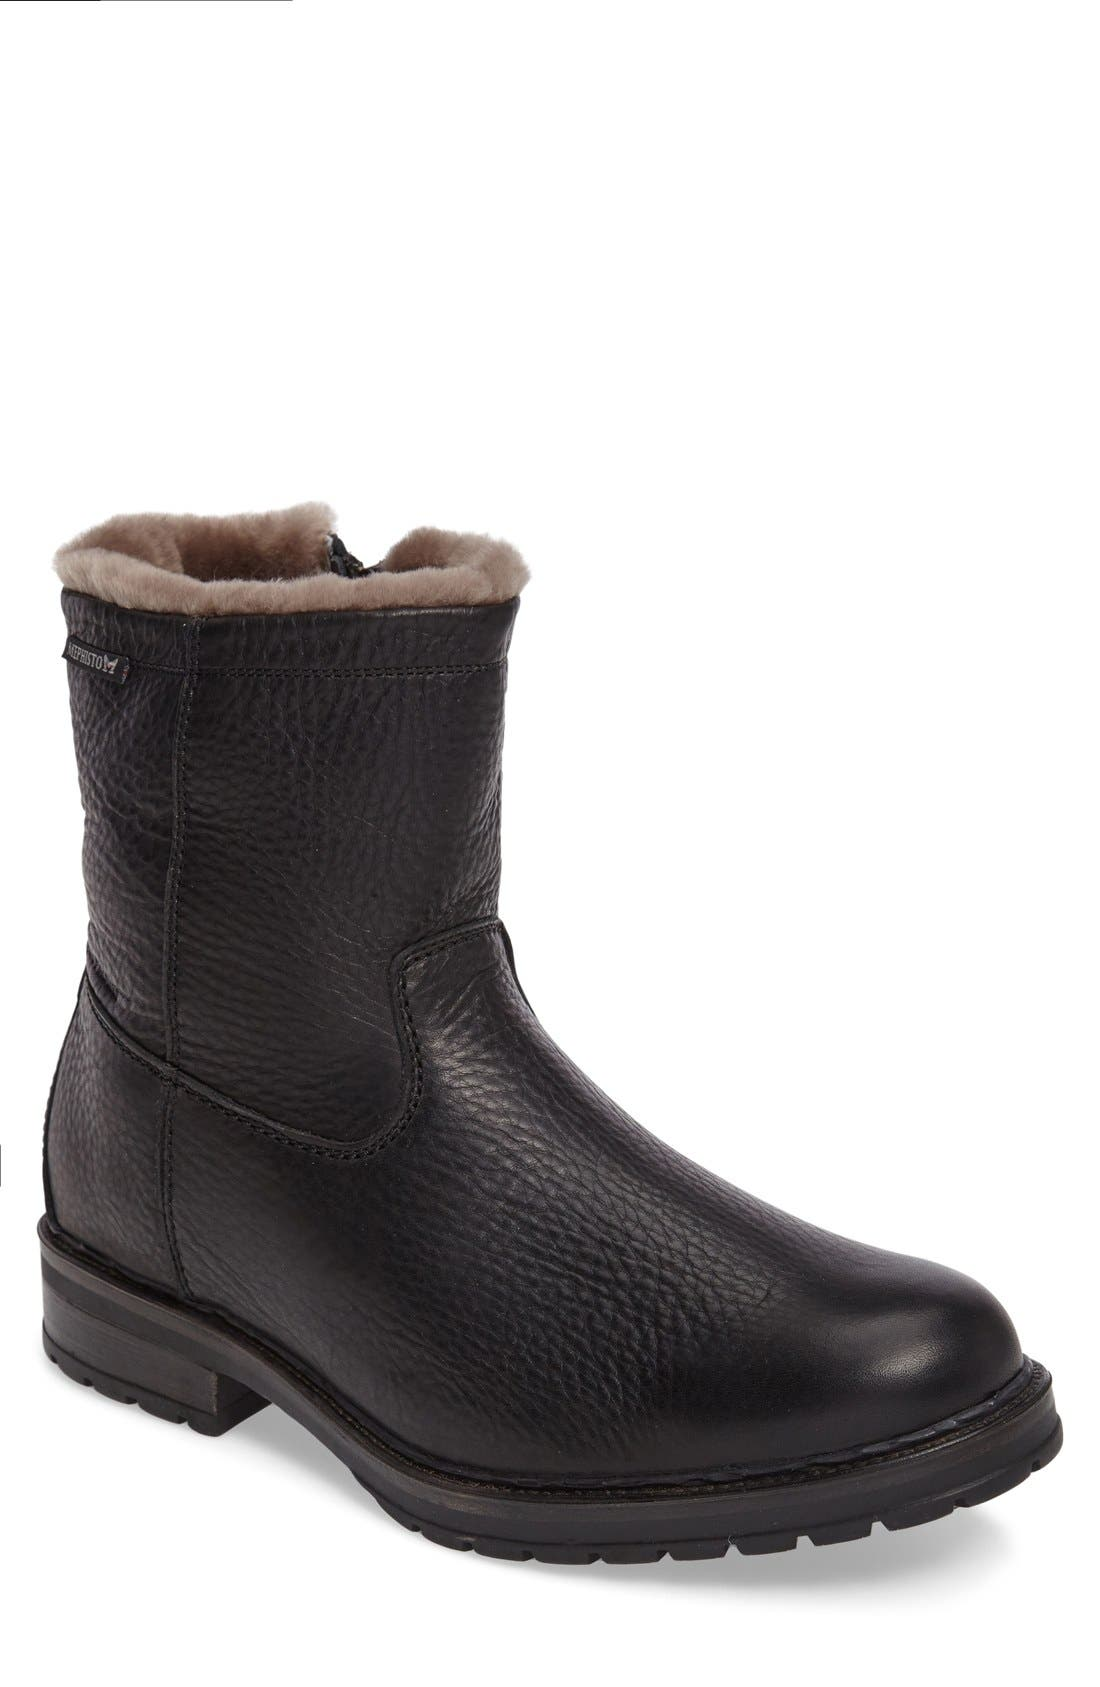 Leonardo Genuine Shearling Lined Boot,                             Main thumbnail 1, color,                             Black Montana